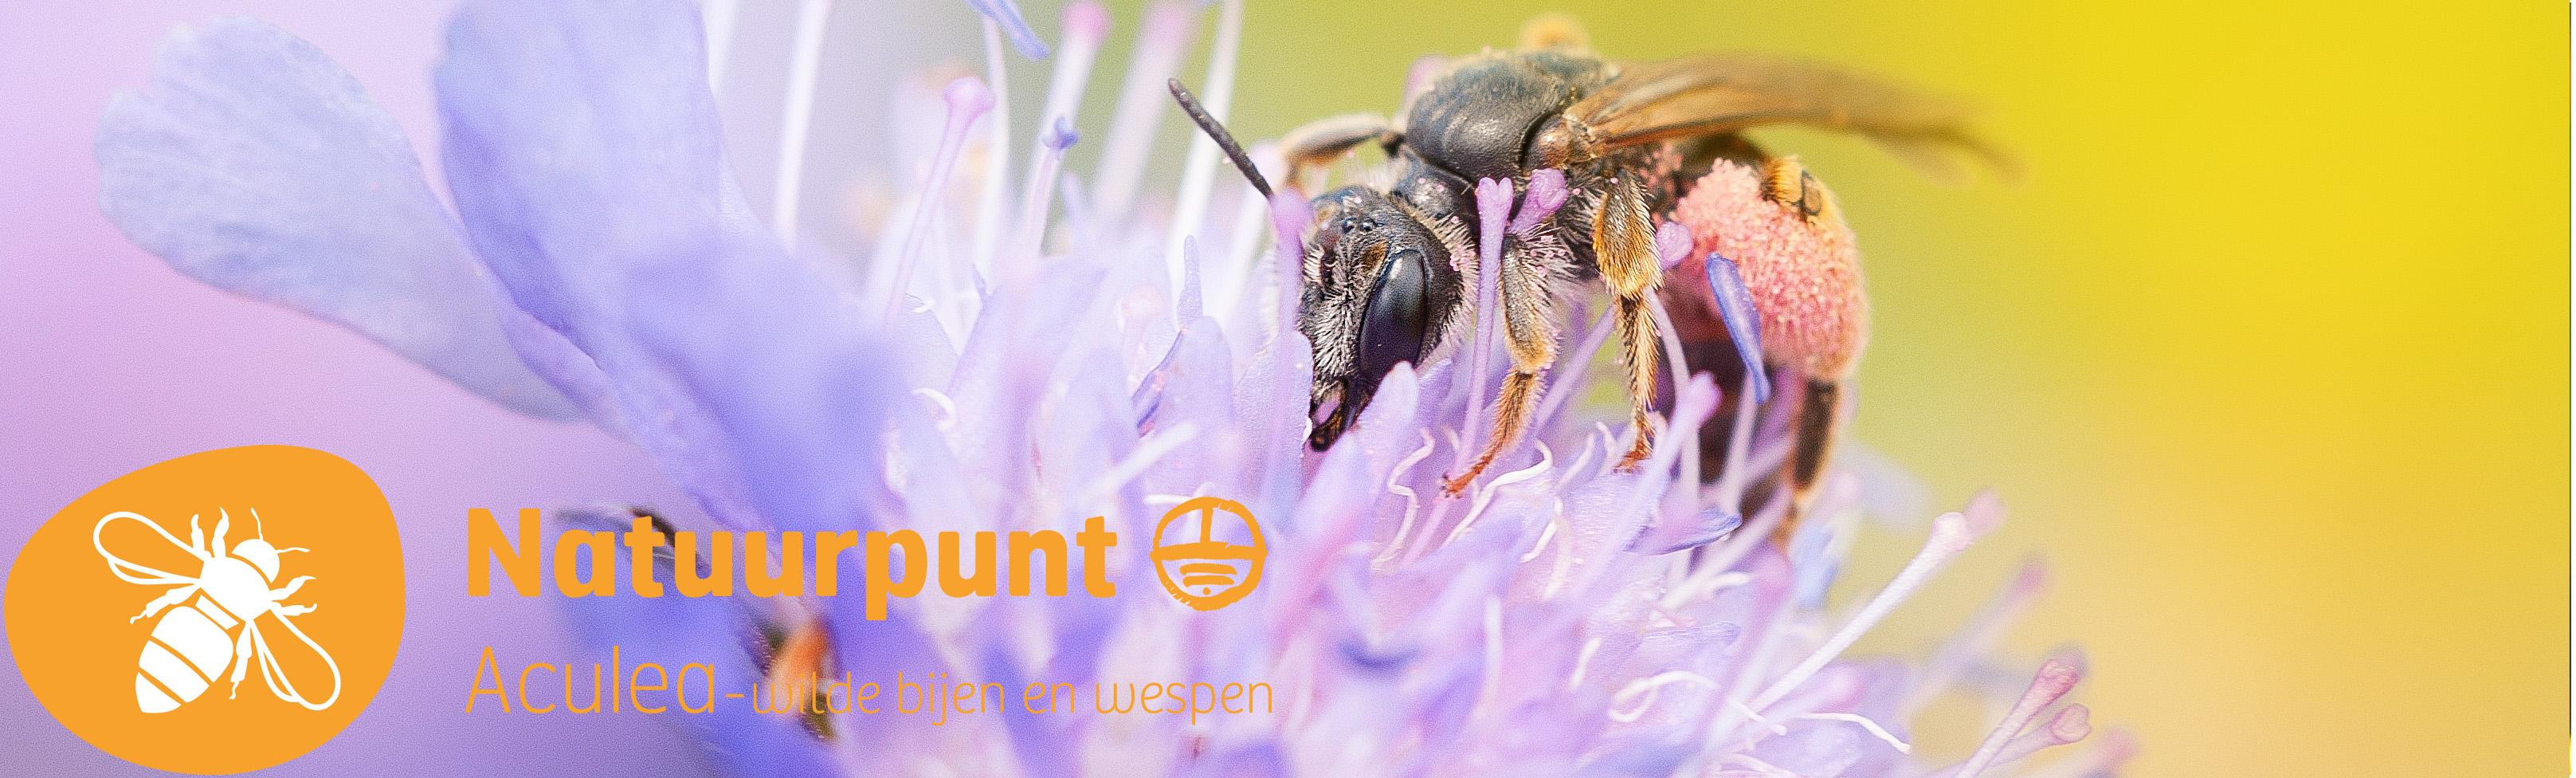 Aculea - Werkgroep wilde bijen en wespen